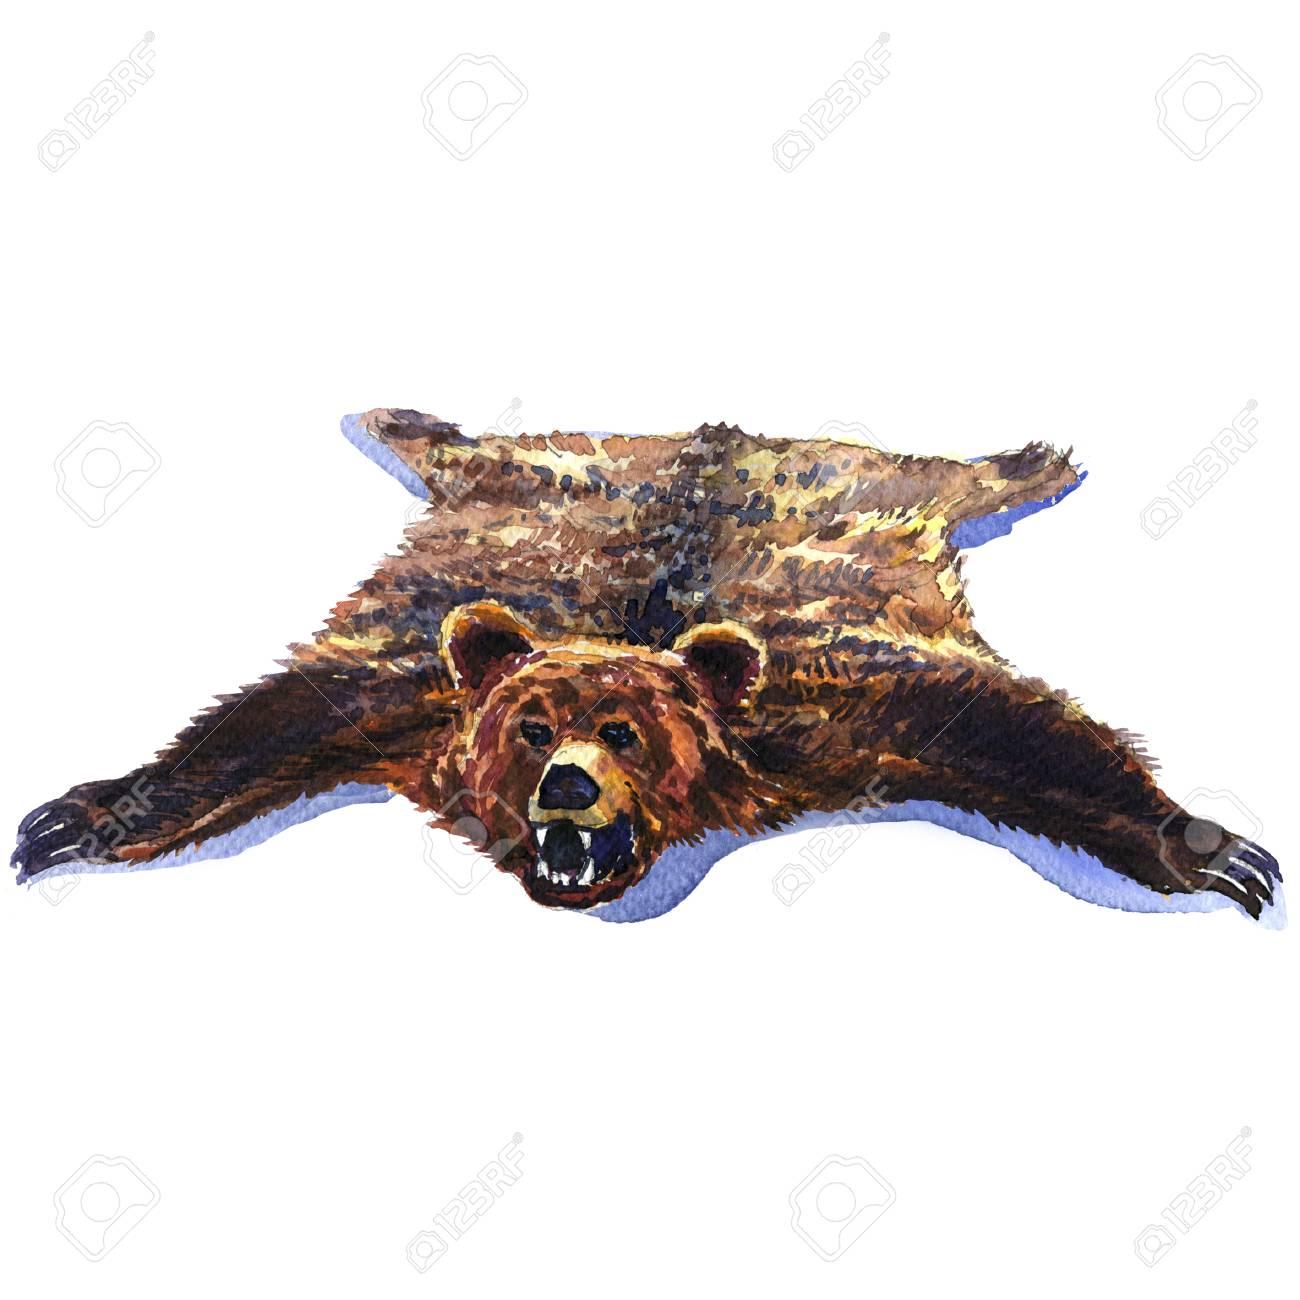 bearskin grande peau d ours brun sauvage isole trophee de chasse illustration aquarelle